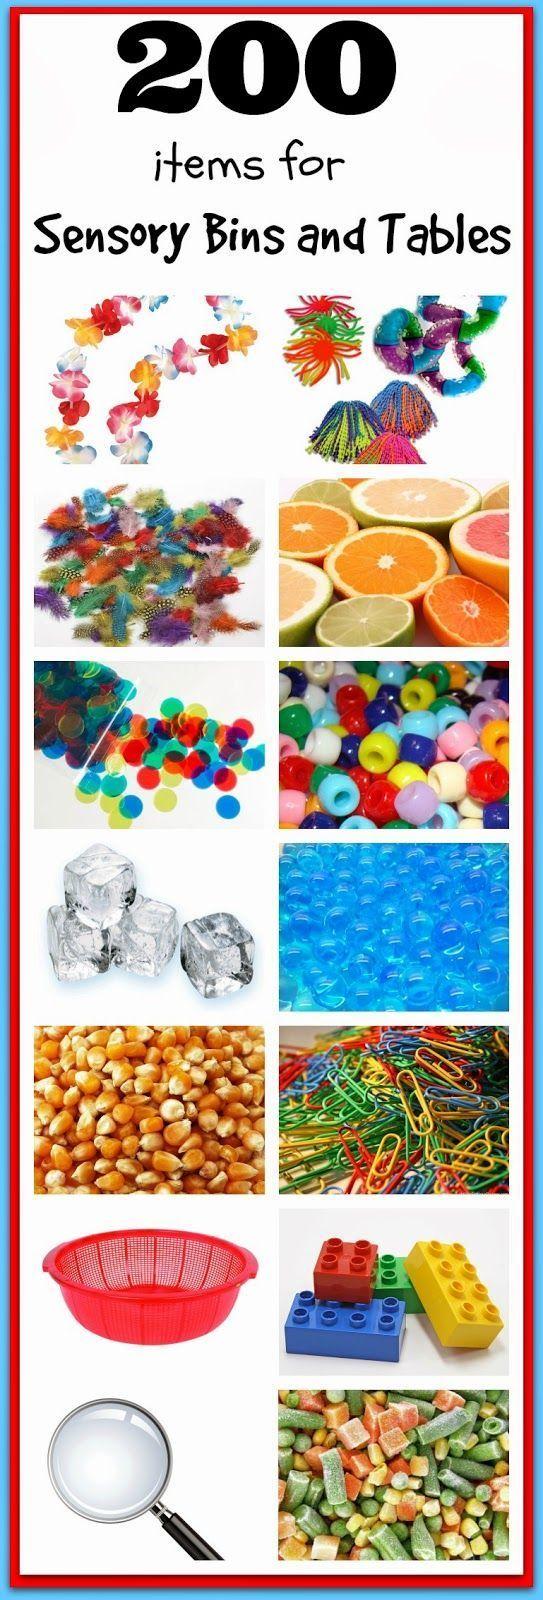 200 items for Sensory Bins and Sensory Tables!   The mega list of ideas for sensory play!!  Make hundreds of awesome sensory bins or sensory tables with this amazing list of ideas!!!